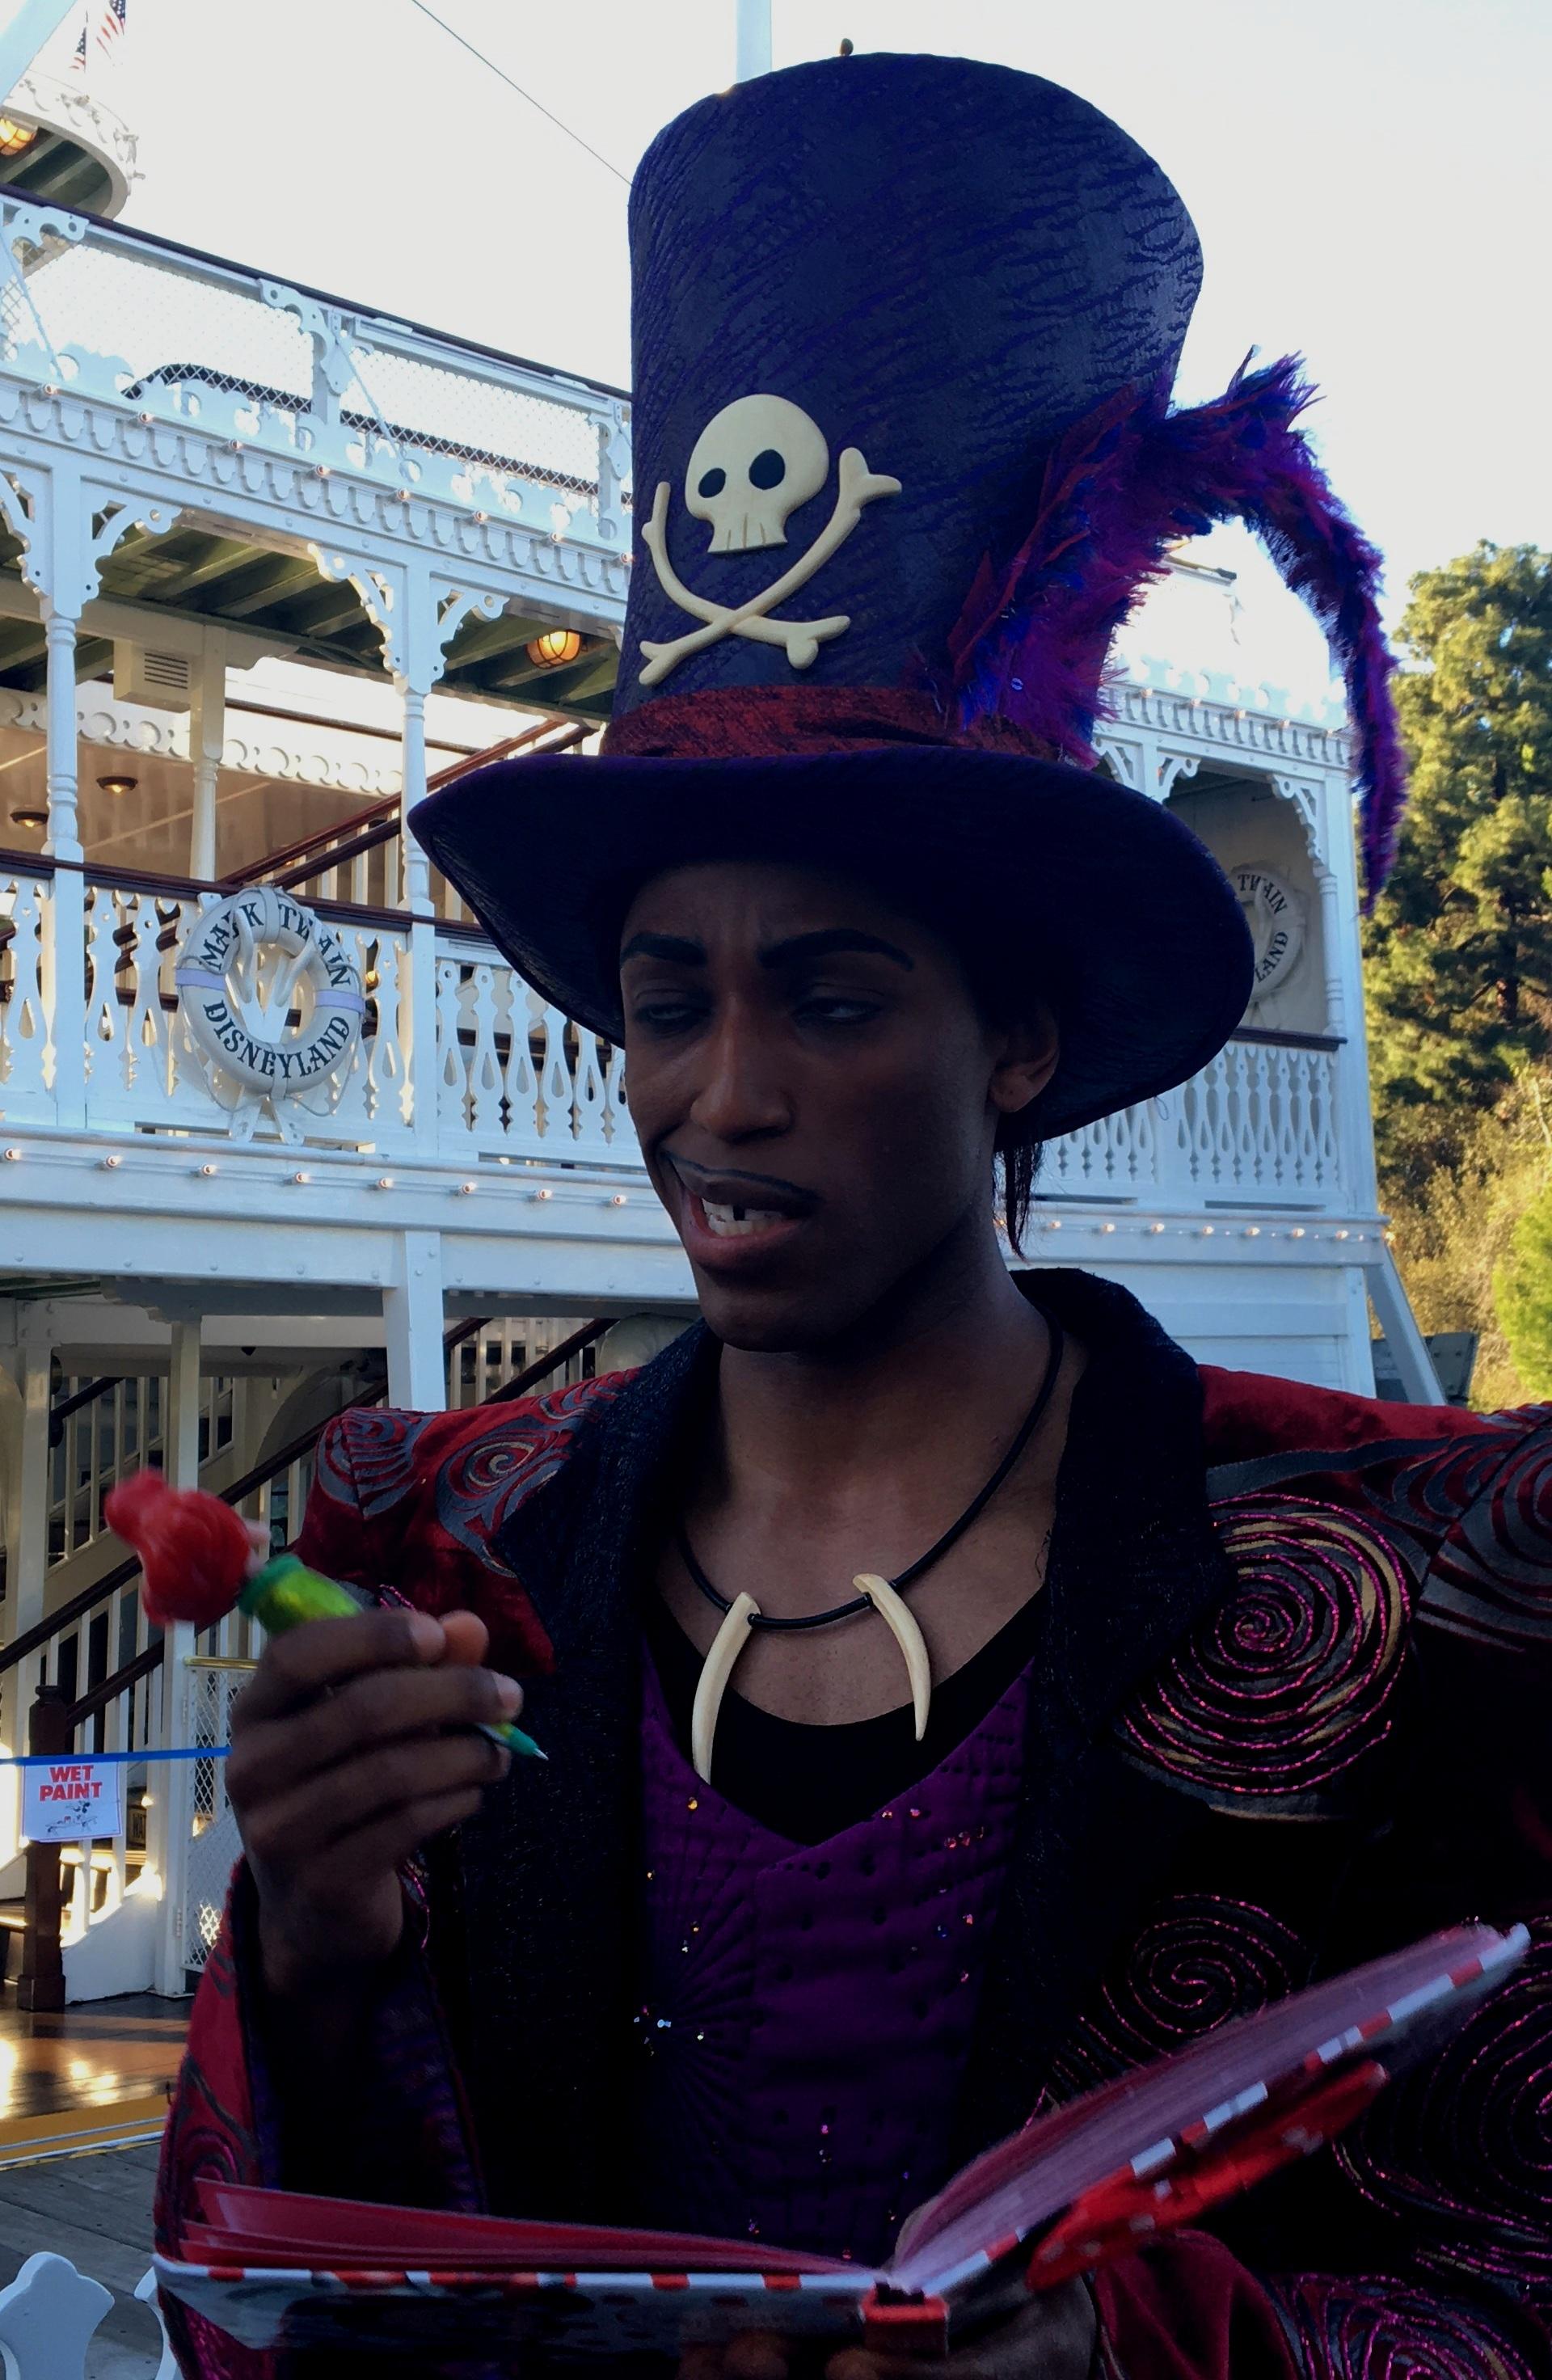 Disneyland Etiquette. #Disneyland #DisneyCaliforniaAdventure #Disney #Travel